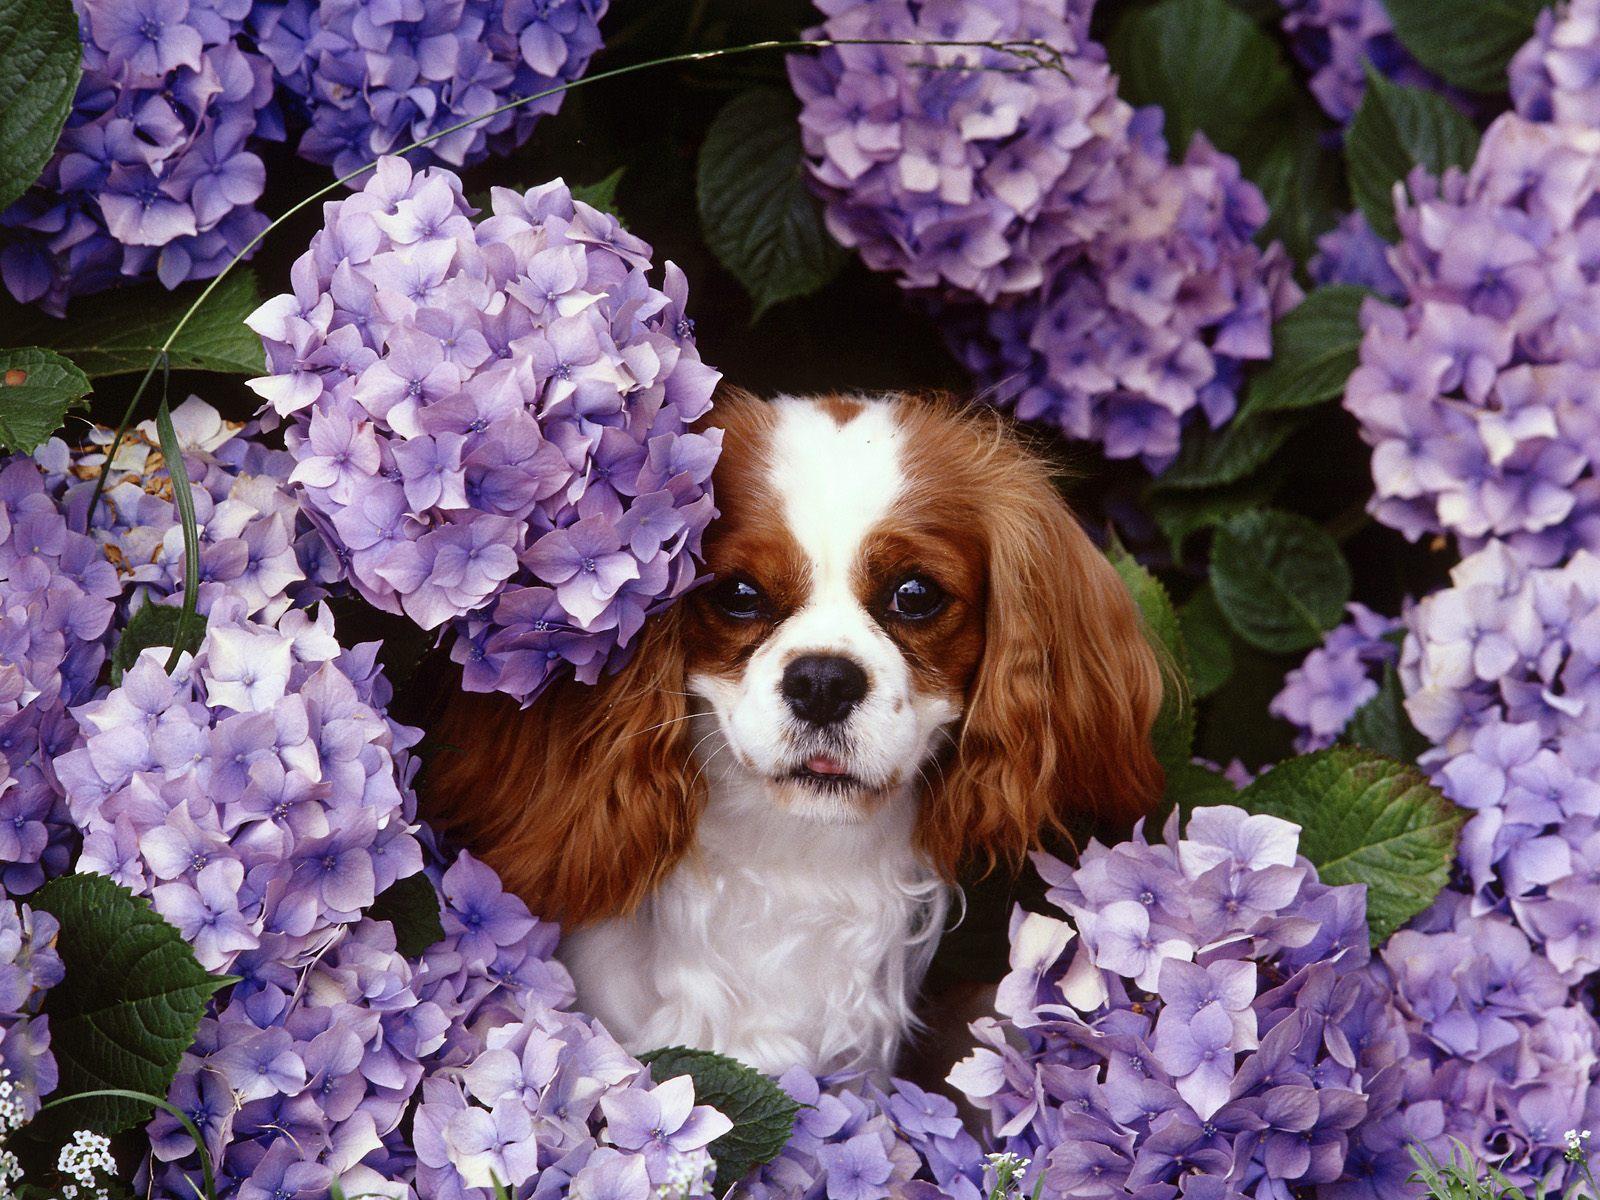 King Charles Spaniel Dog: King King Charles Spaniel Dog In Flowers Breed